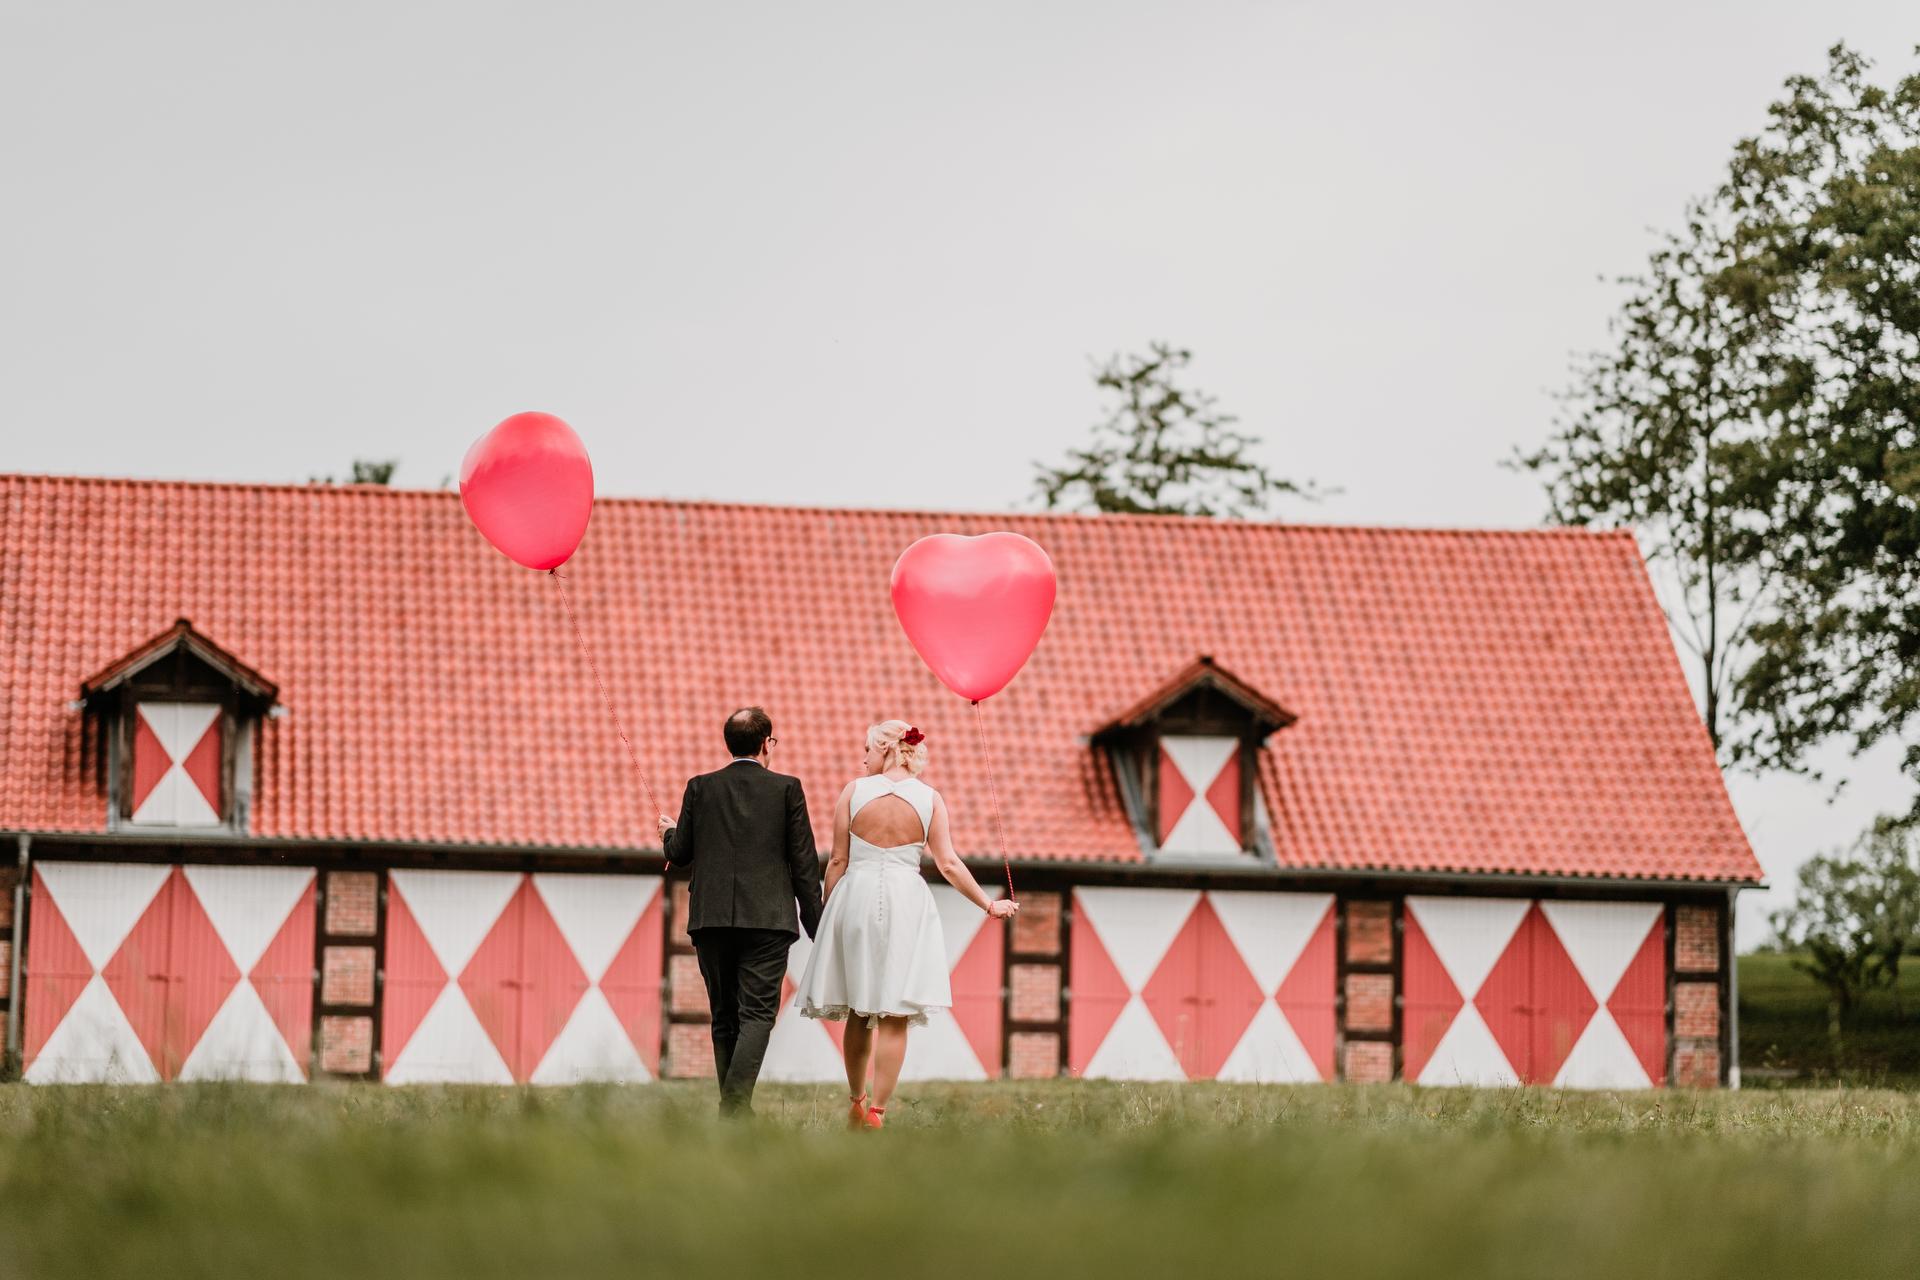 Hzt-Ann-Christin-Stefan-Standesamt-05-2019-030